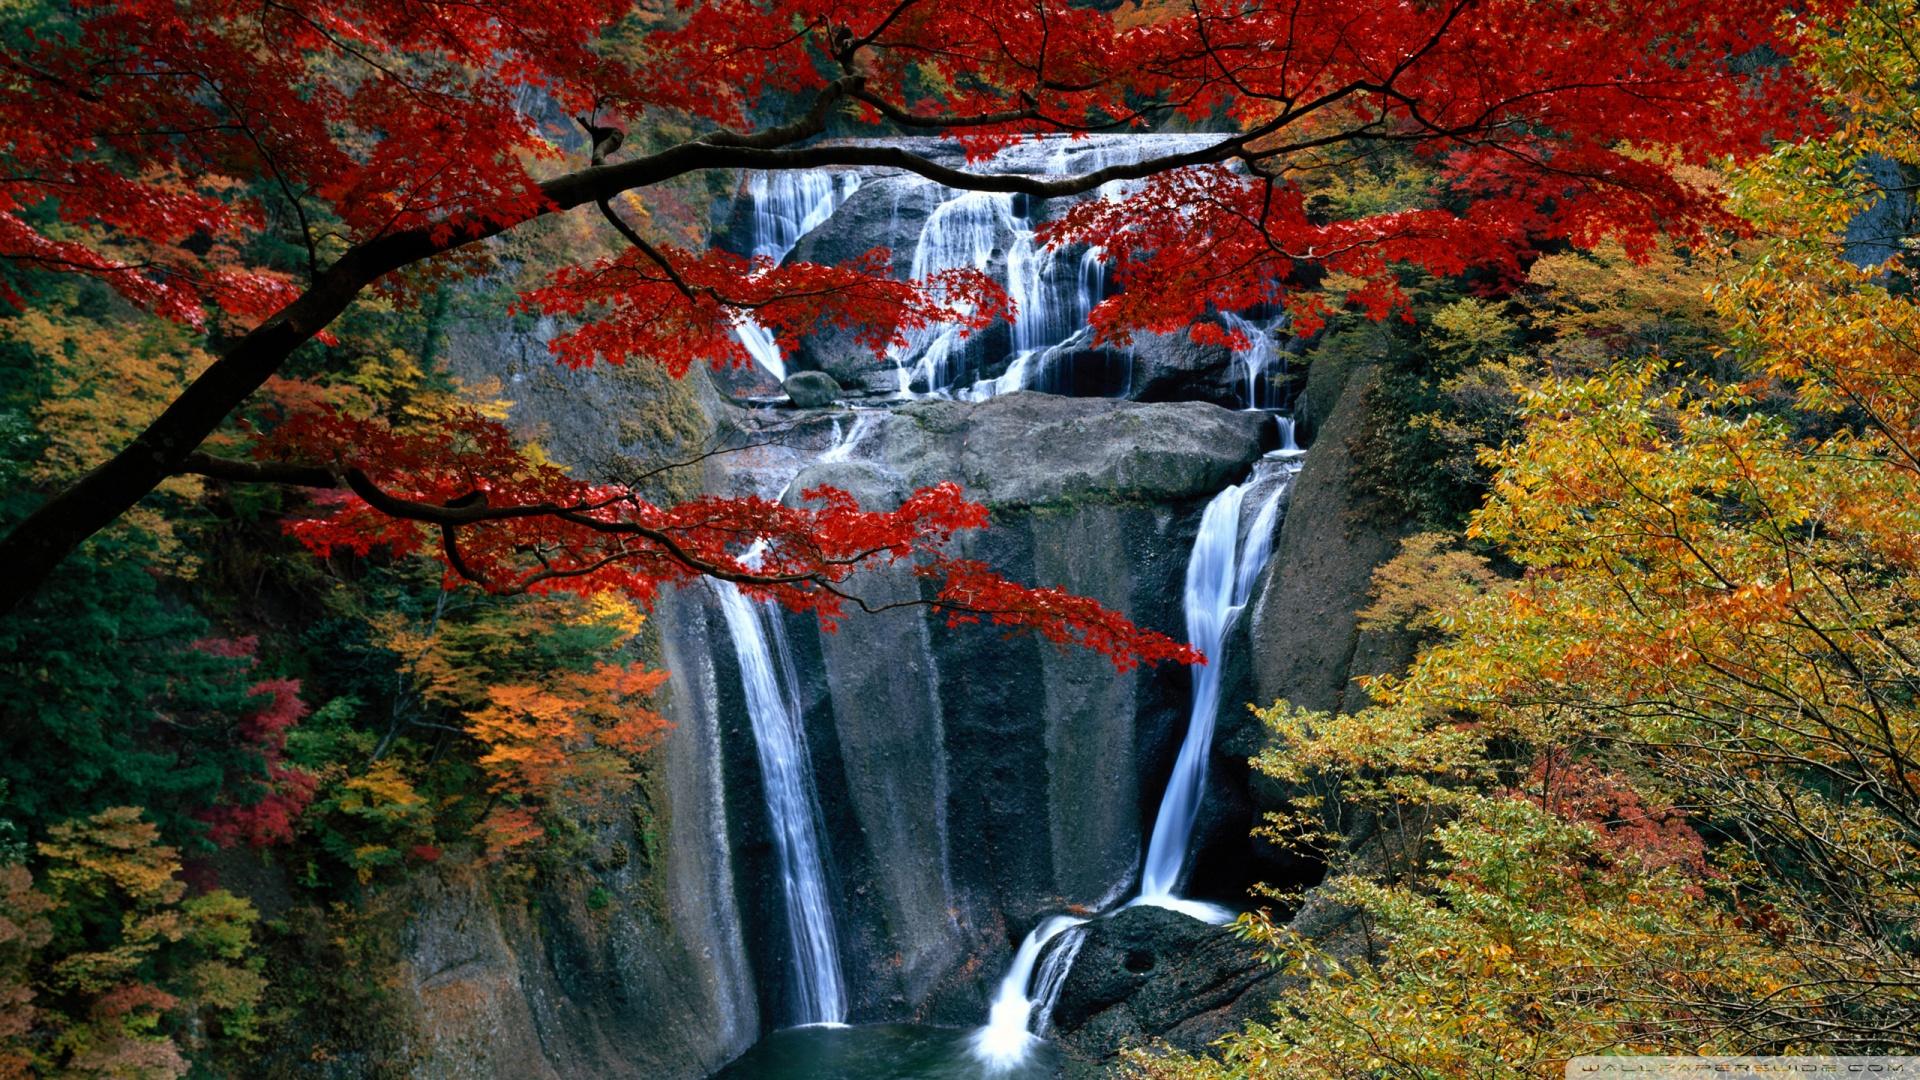 Waterfall Autumn Wallpaper 1920x1080 Waterfall Autumn 1920x1080